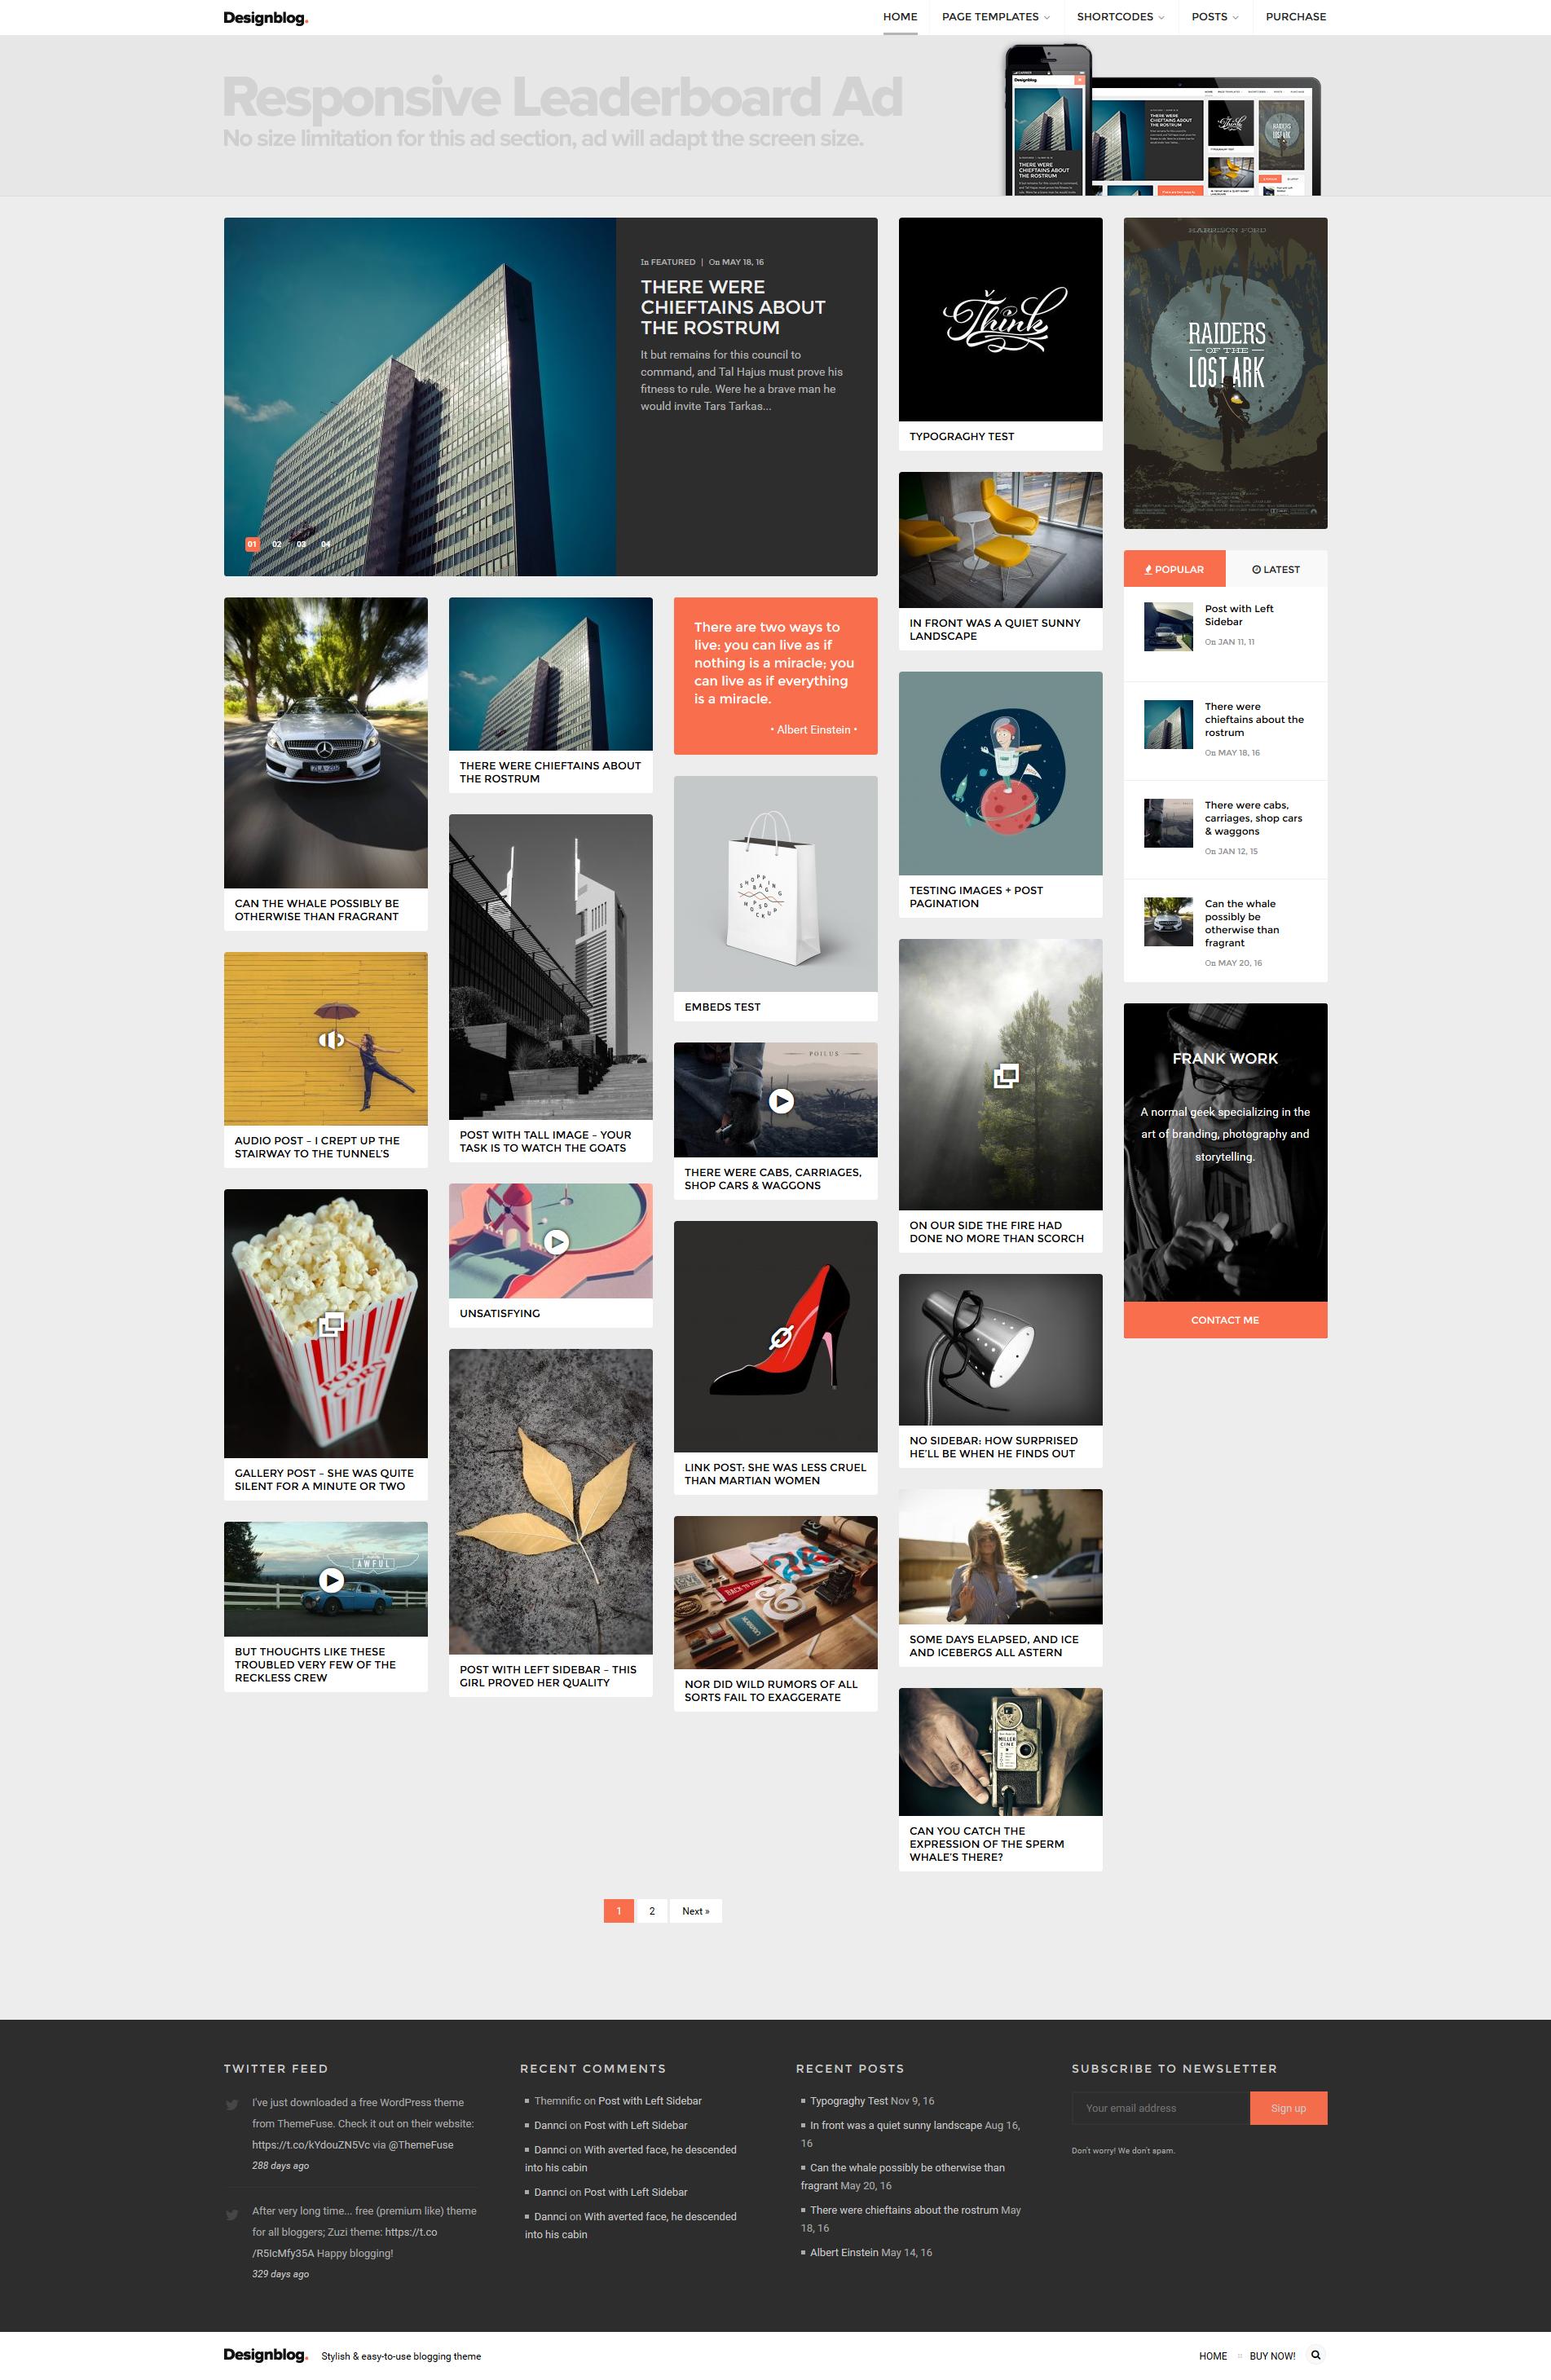 Design Blog - A Minimal and Creative Blog Theme for WordPress by Dannci